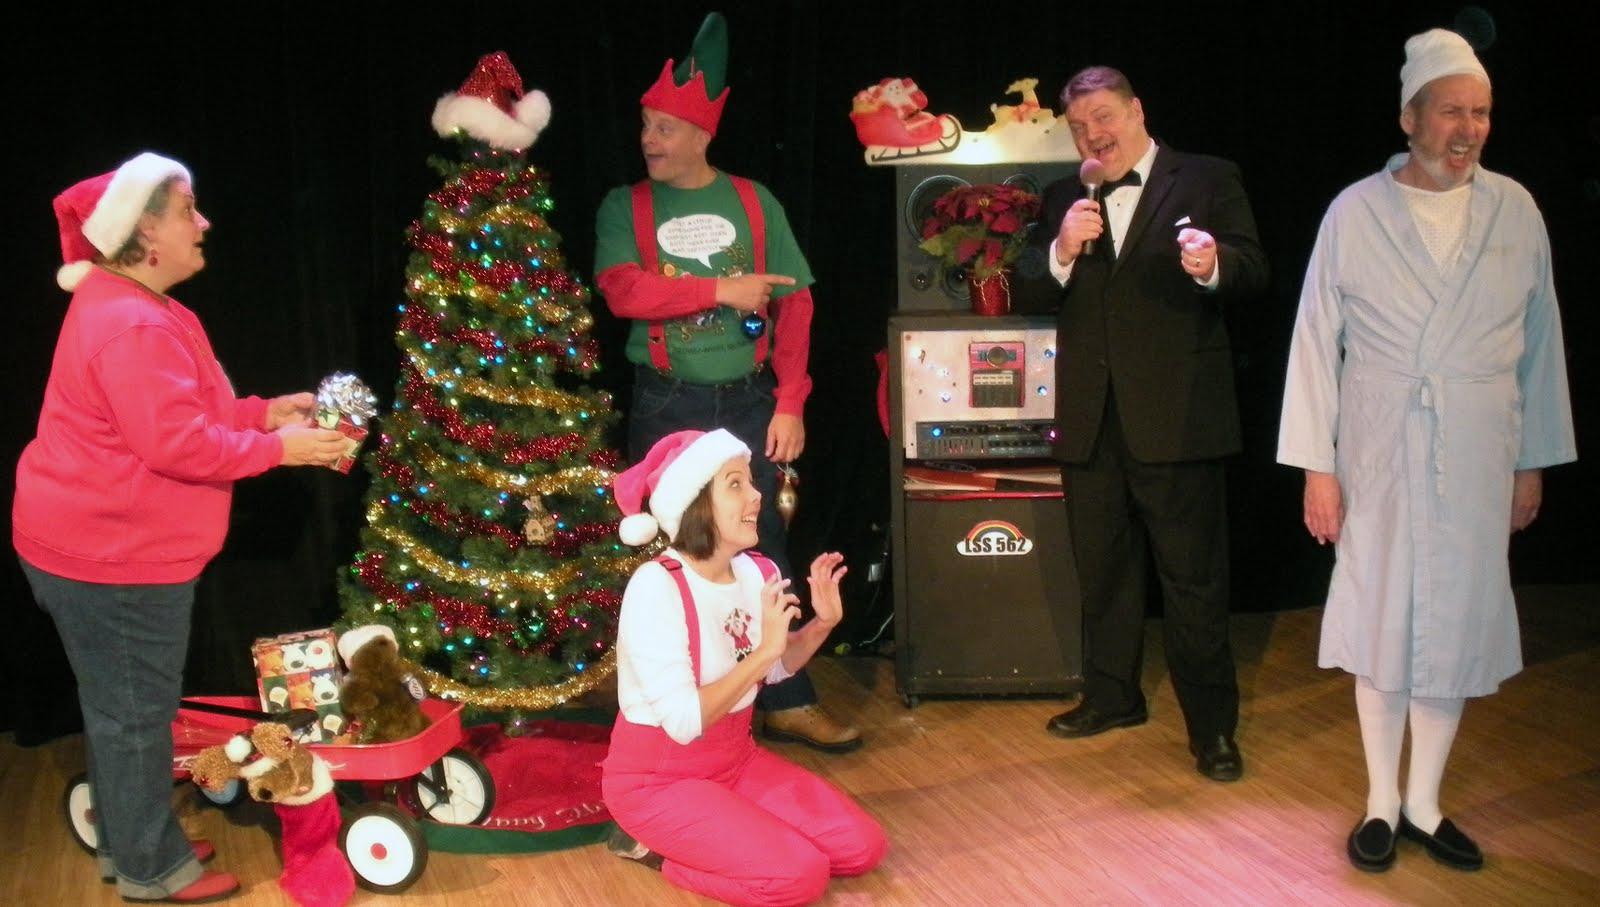 Don't Hug Me is an entertaining Christmas show |